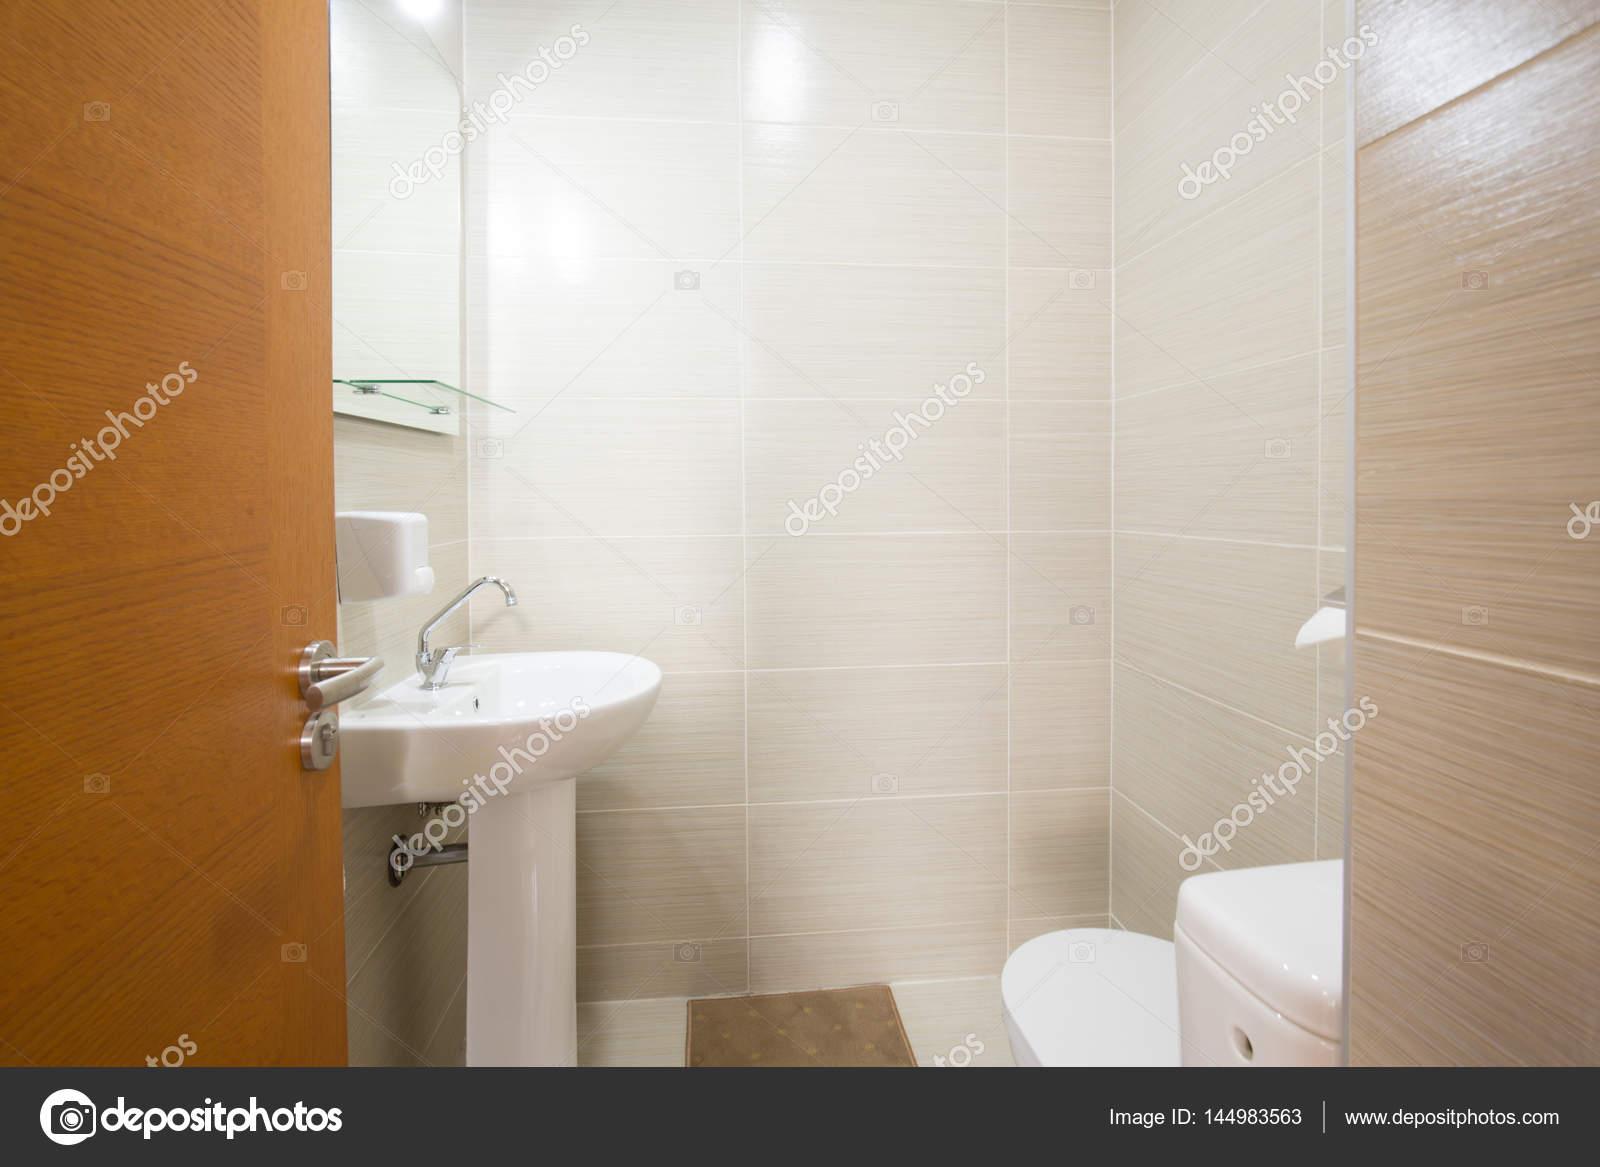 Badkamer Interieur Design : Kleine badkamer interieur design u stockfoto rilueda